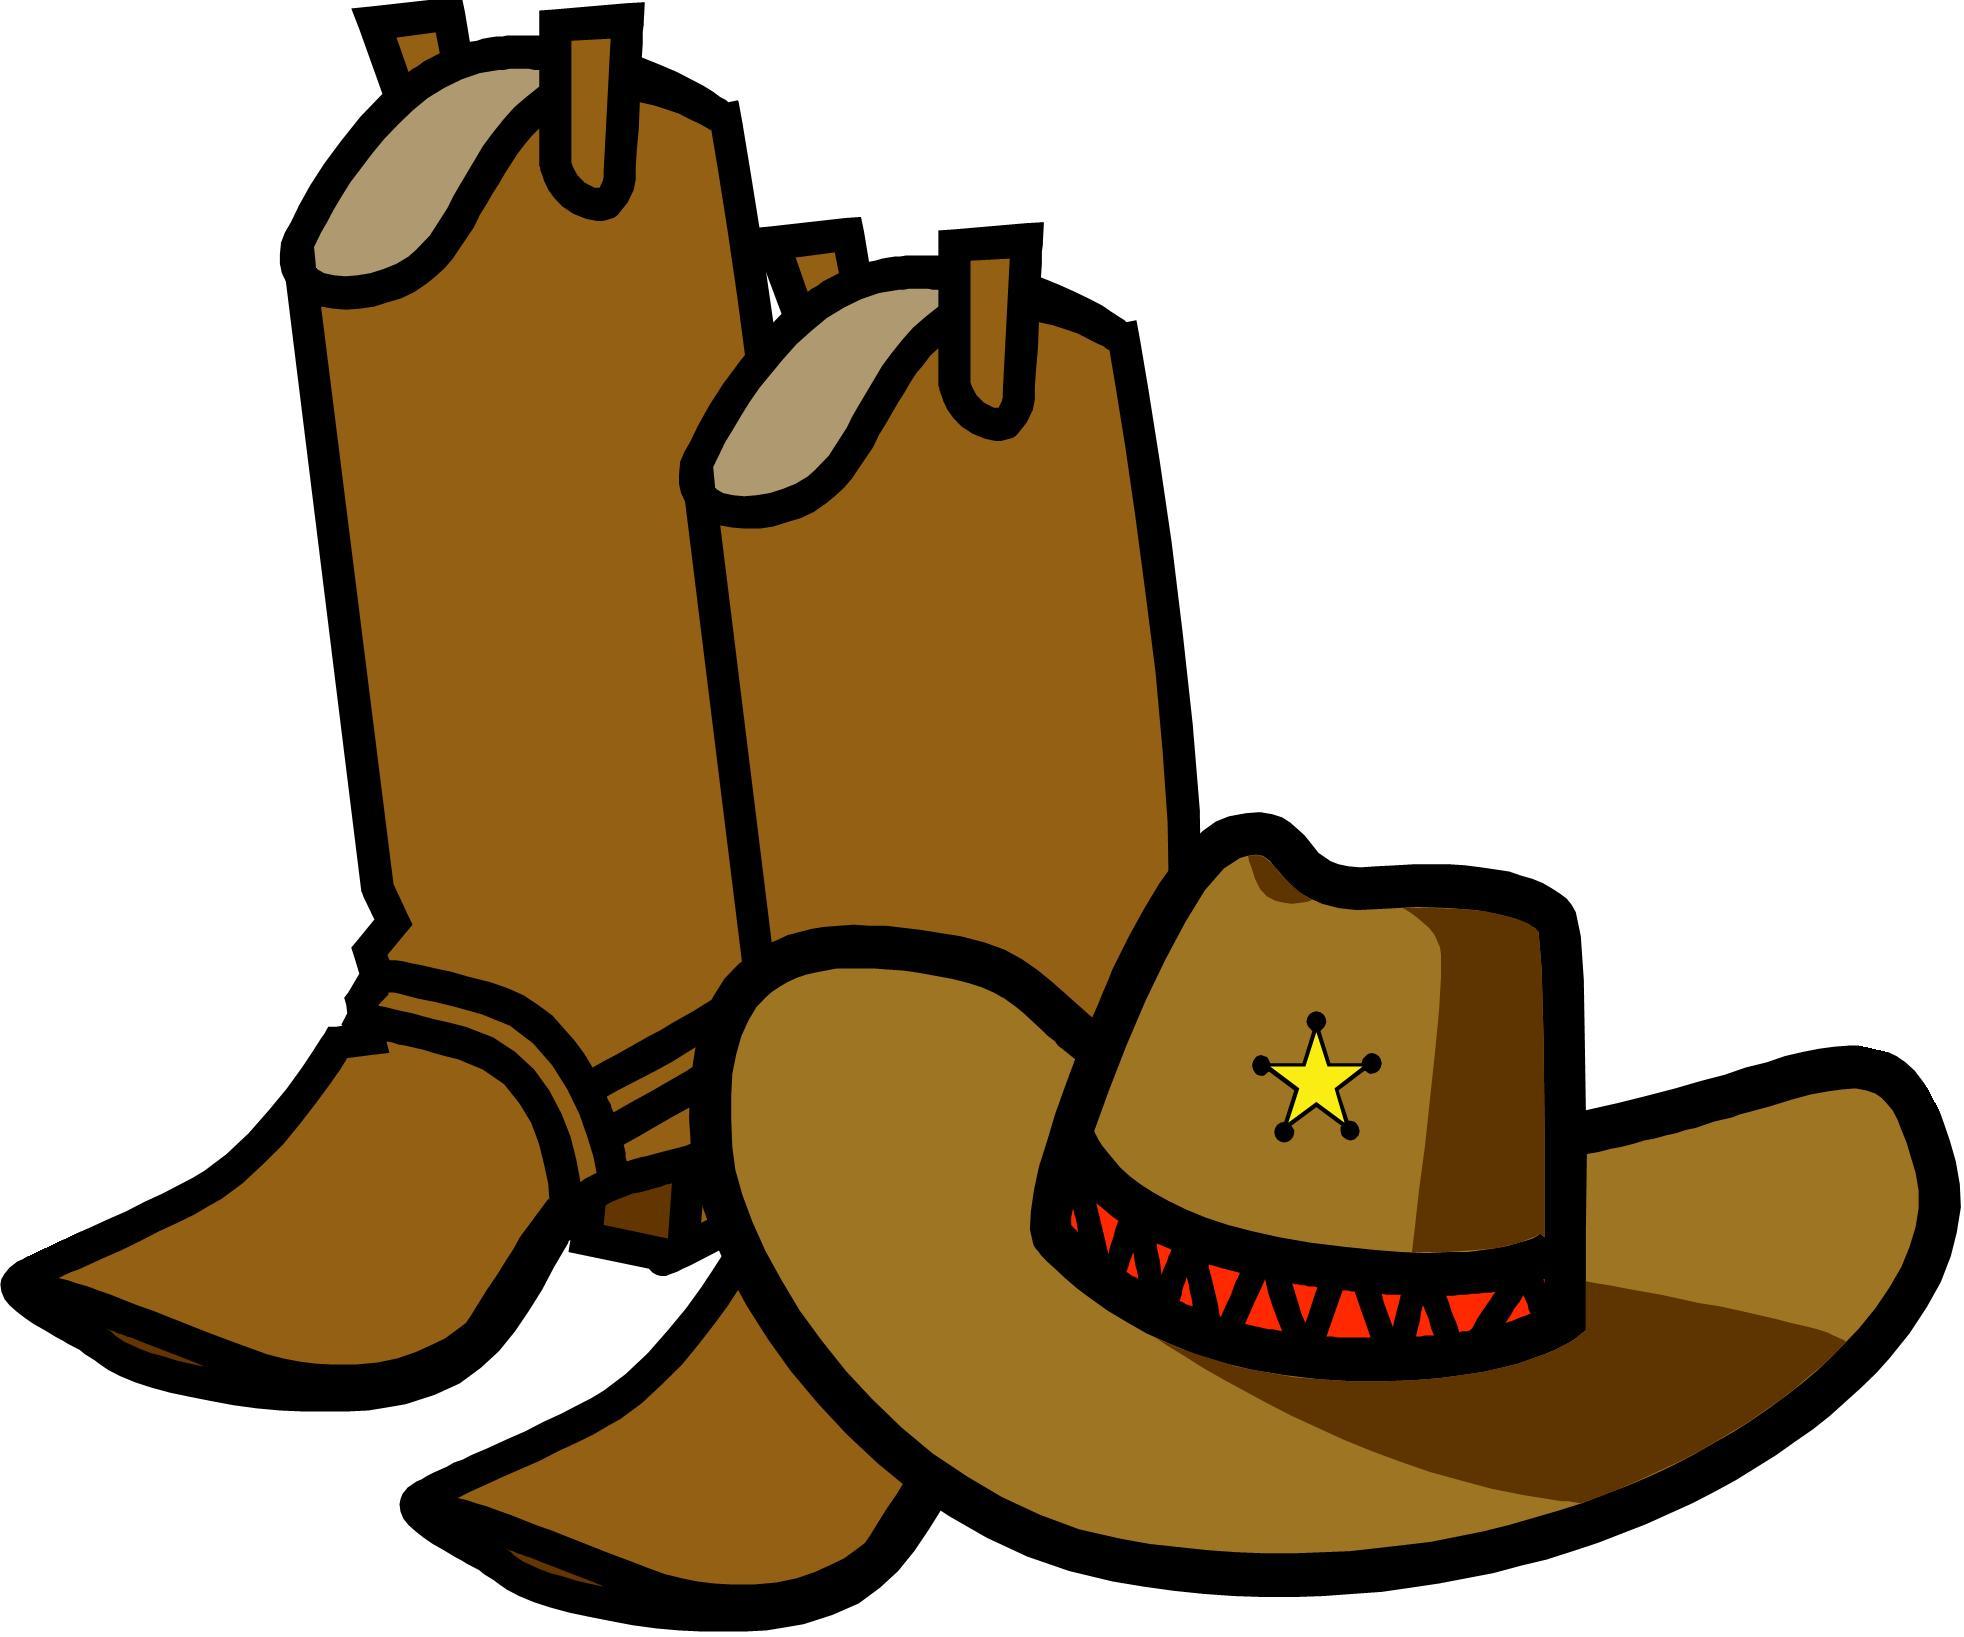 1964x1637 Wild West Clipart Cowboy Theme